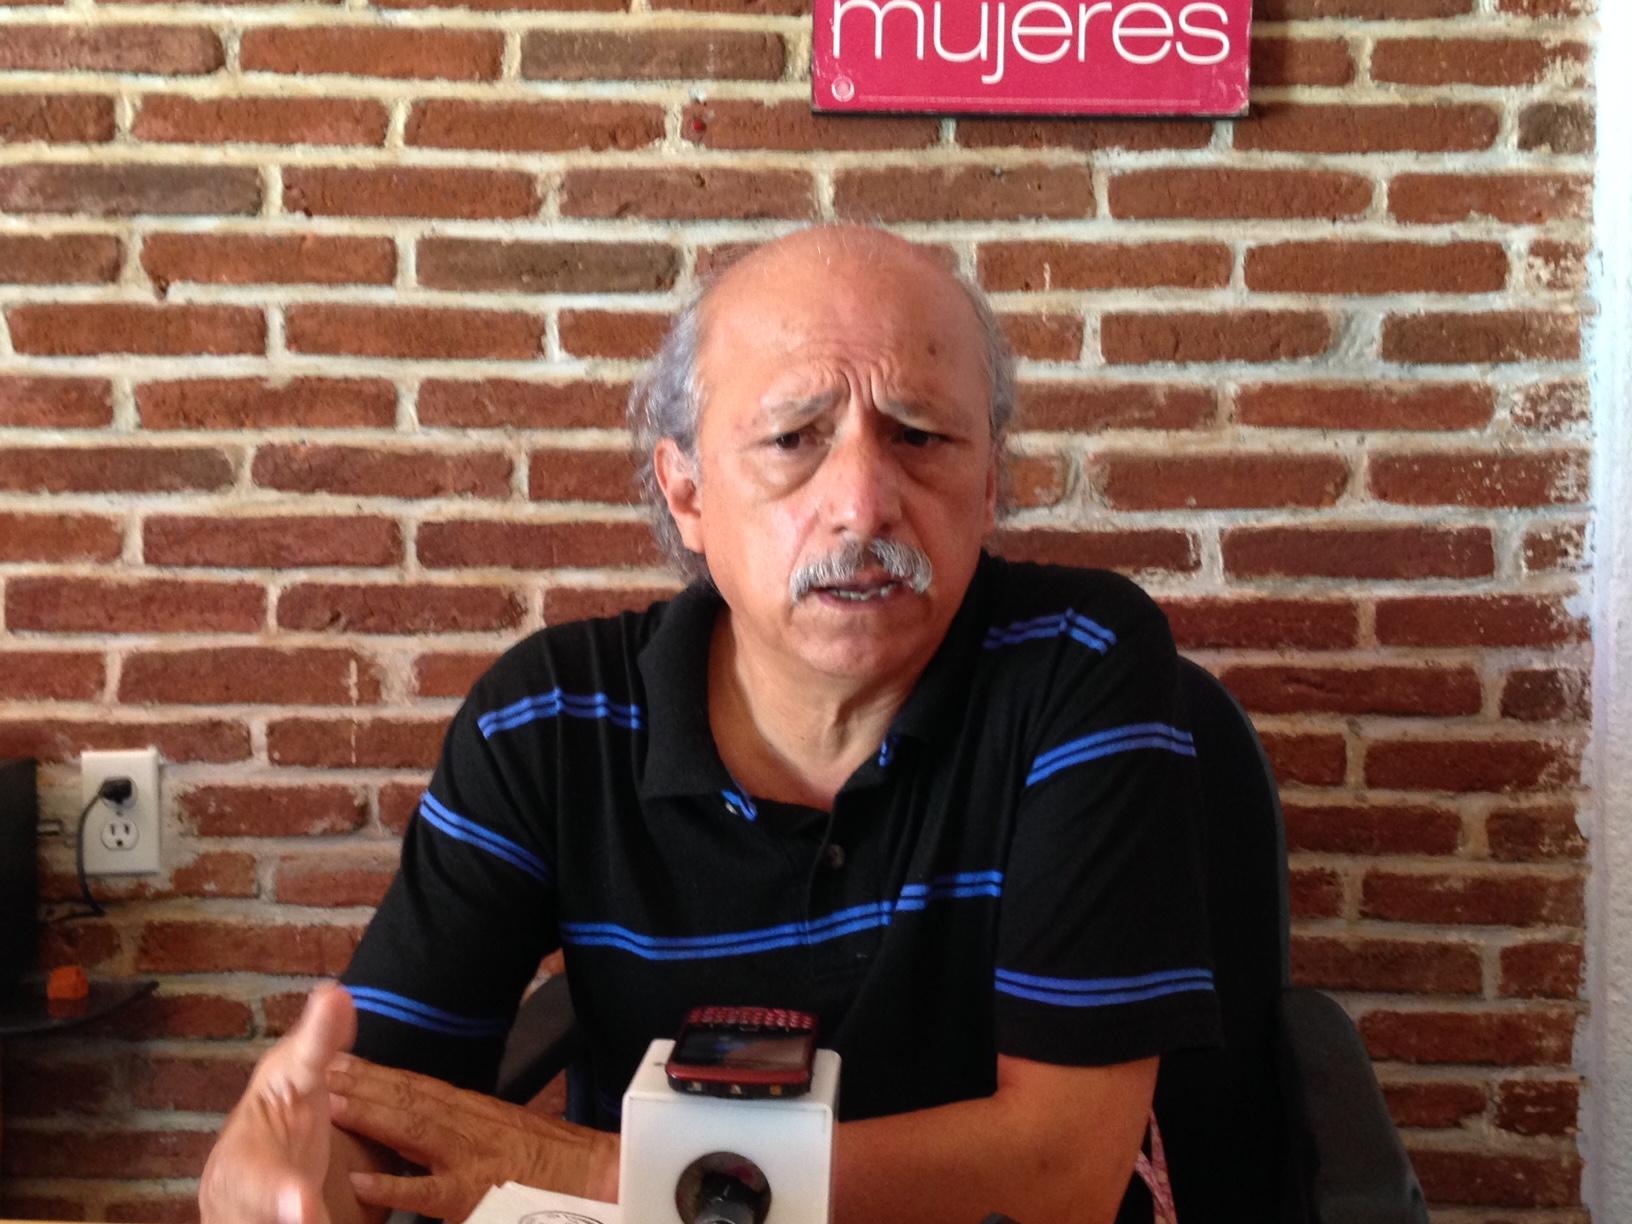 CIDH José Martínez Cruz